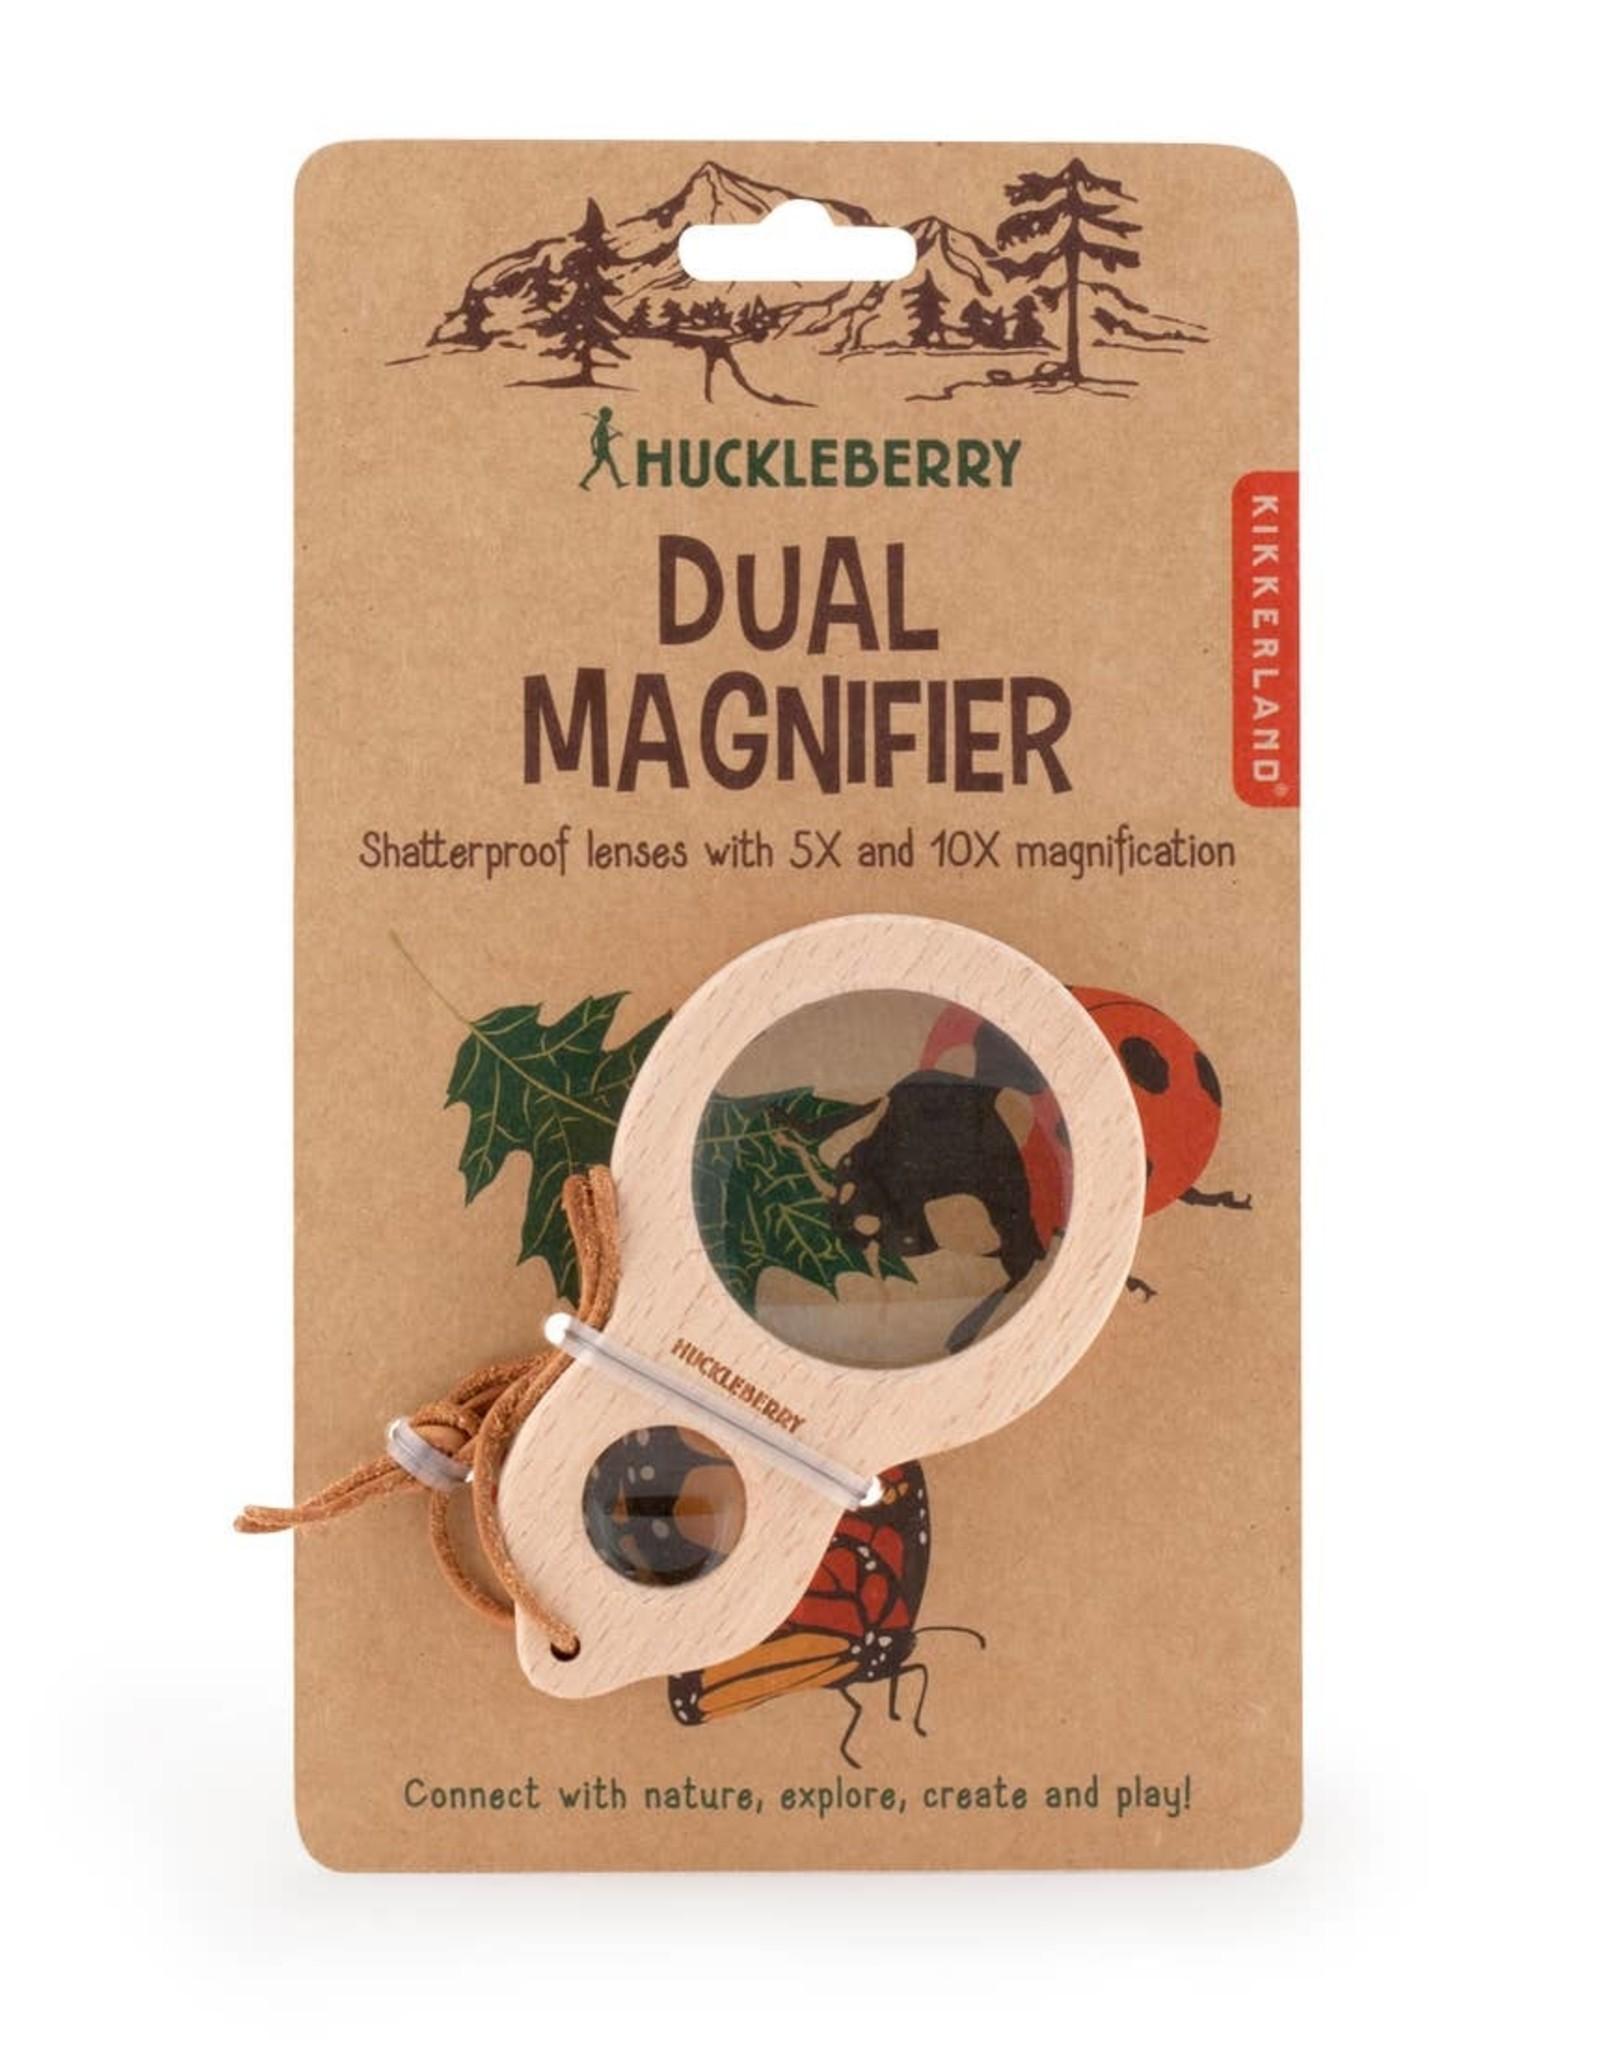 huckleberry by kirkland Huckleberry Dual Magnifier Glass